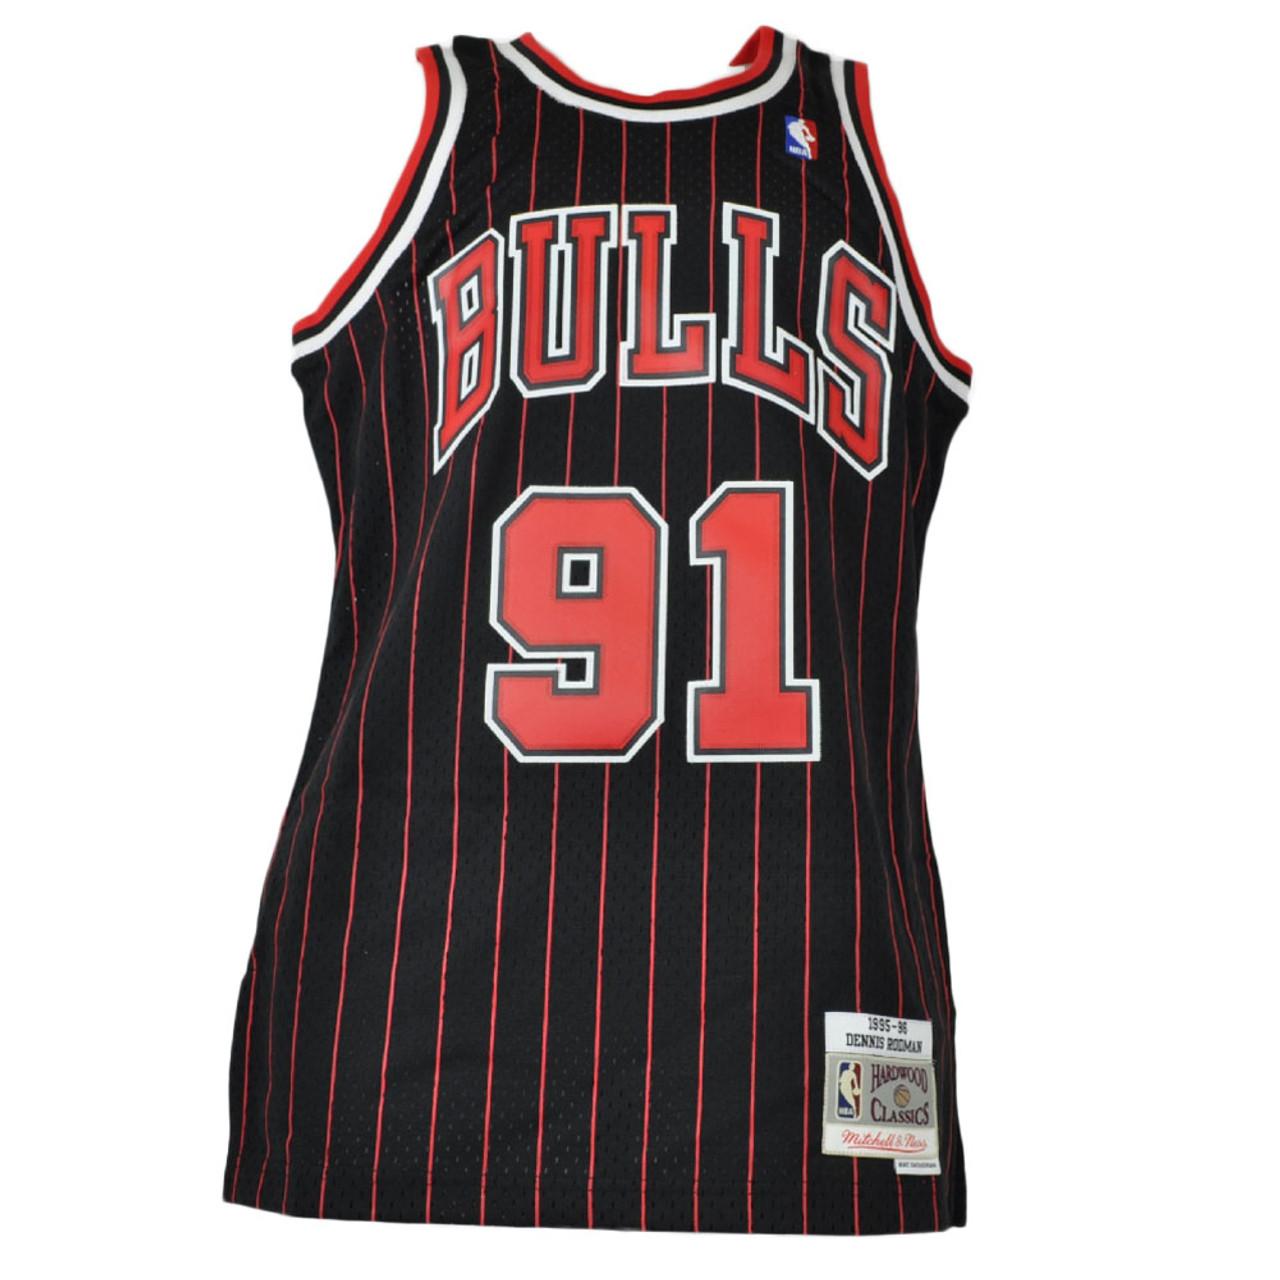 Black//Stripe Chicago Bulls Dennis Rodman # 91 Retro Swingman Basketball Jersey